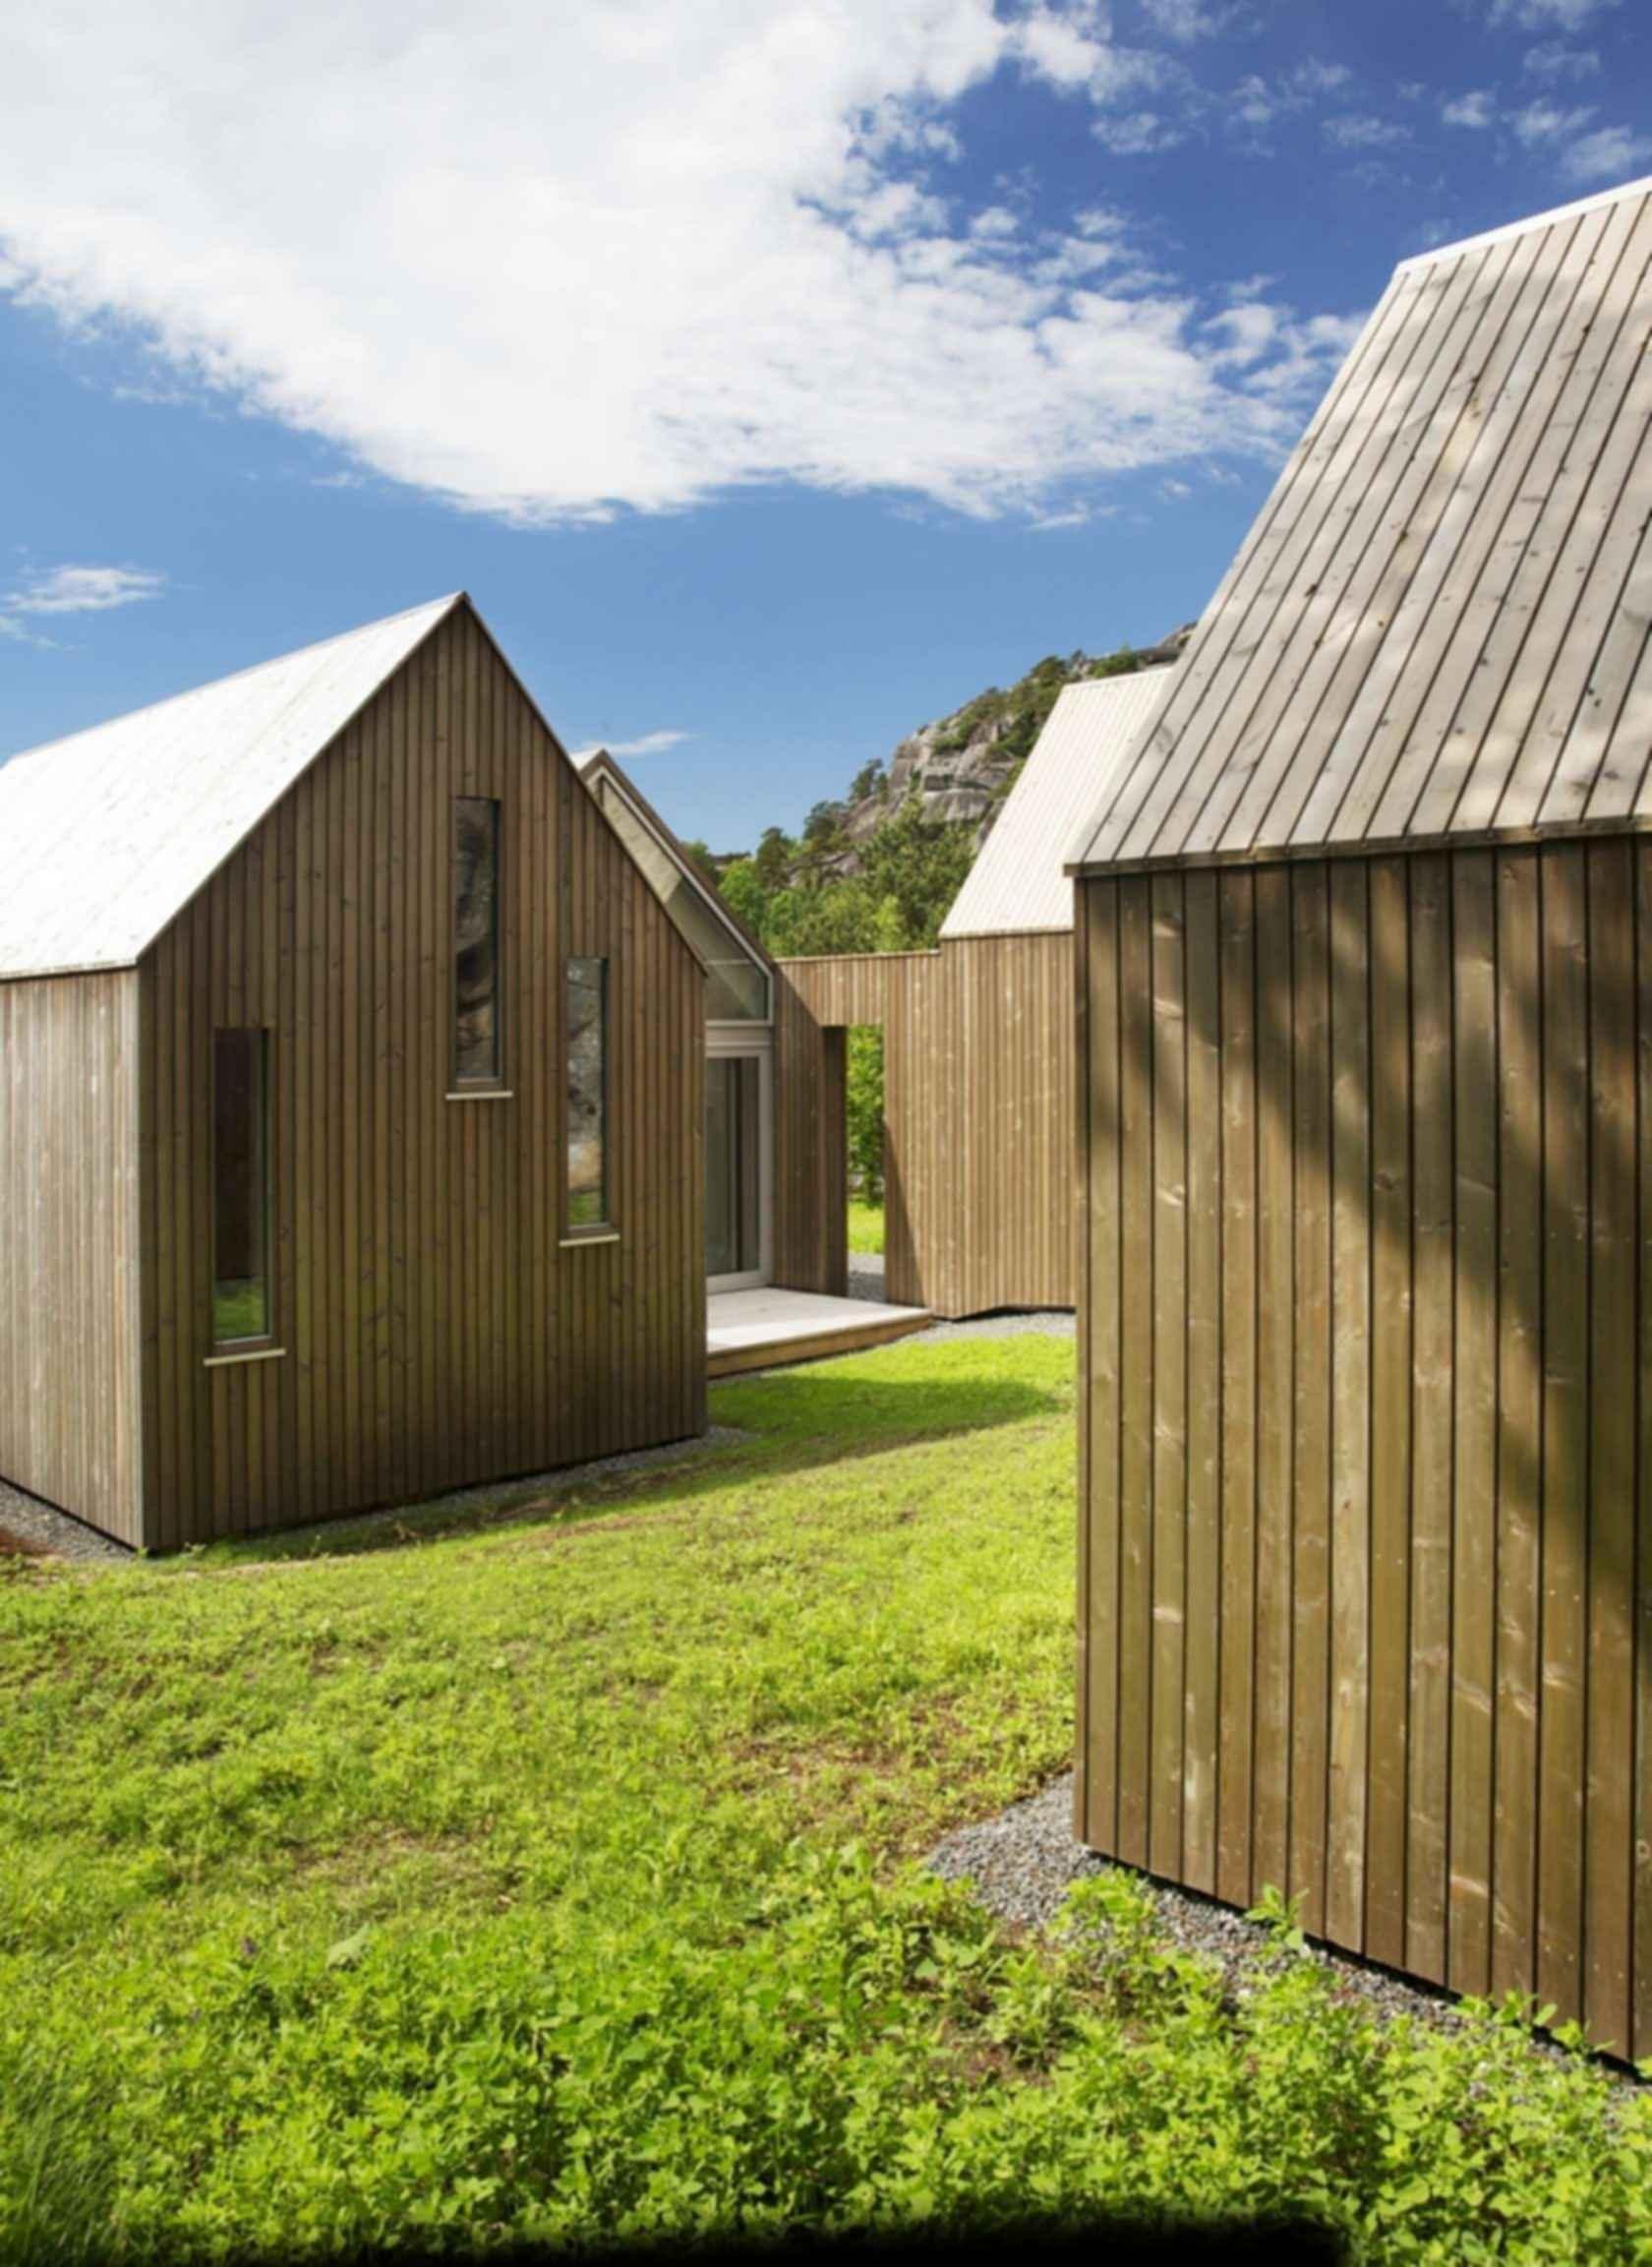 Micro Cluster Cabins - Exterior/Outdoor Area